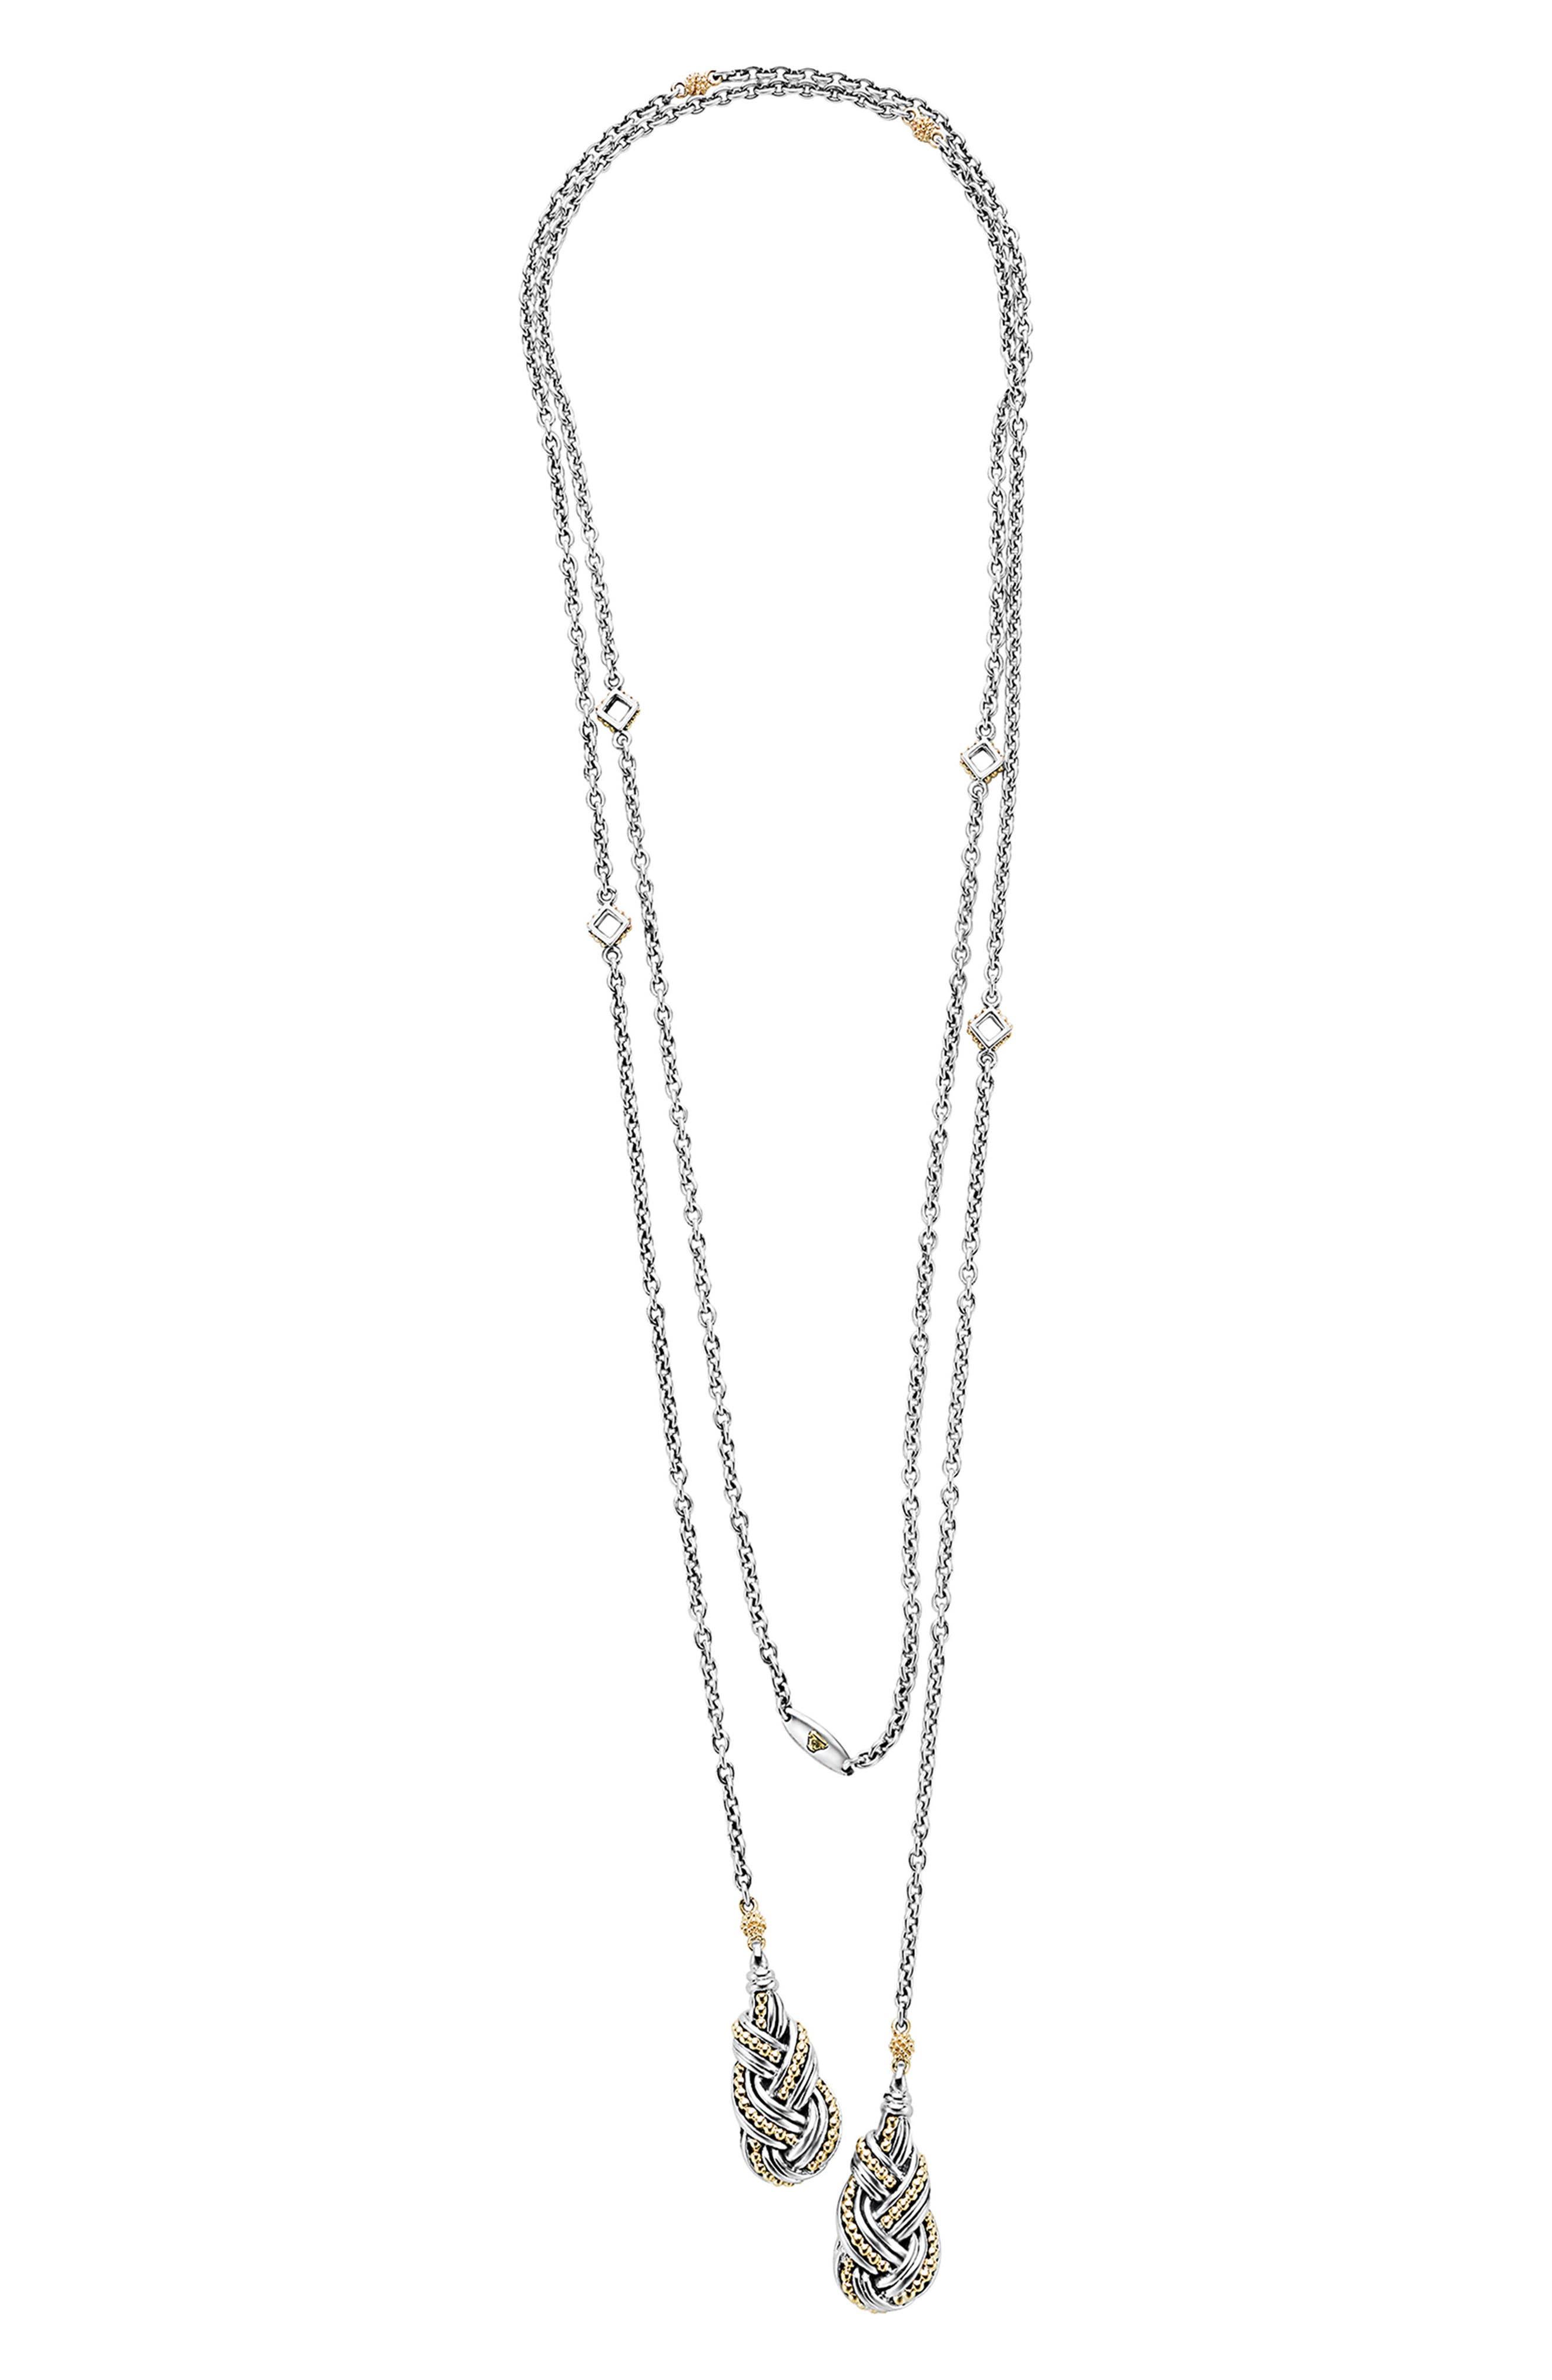 Torsade Lariat Necklace,                         Main,                         color, Silver/ Gold